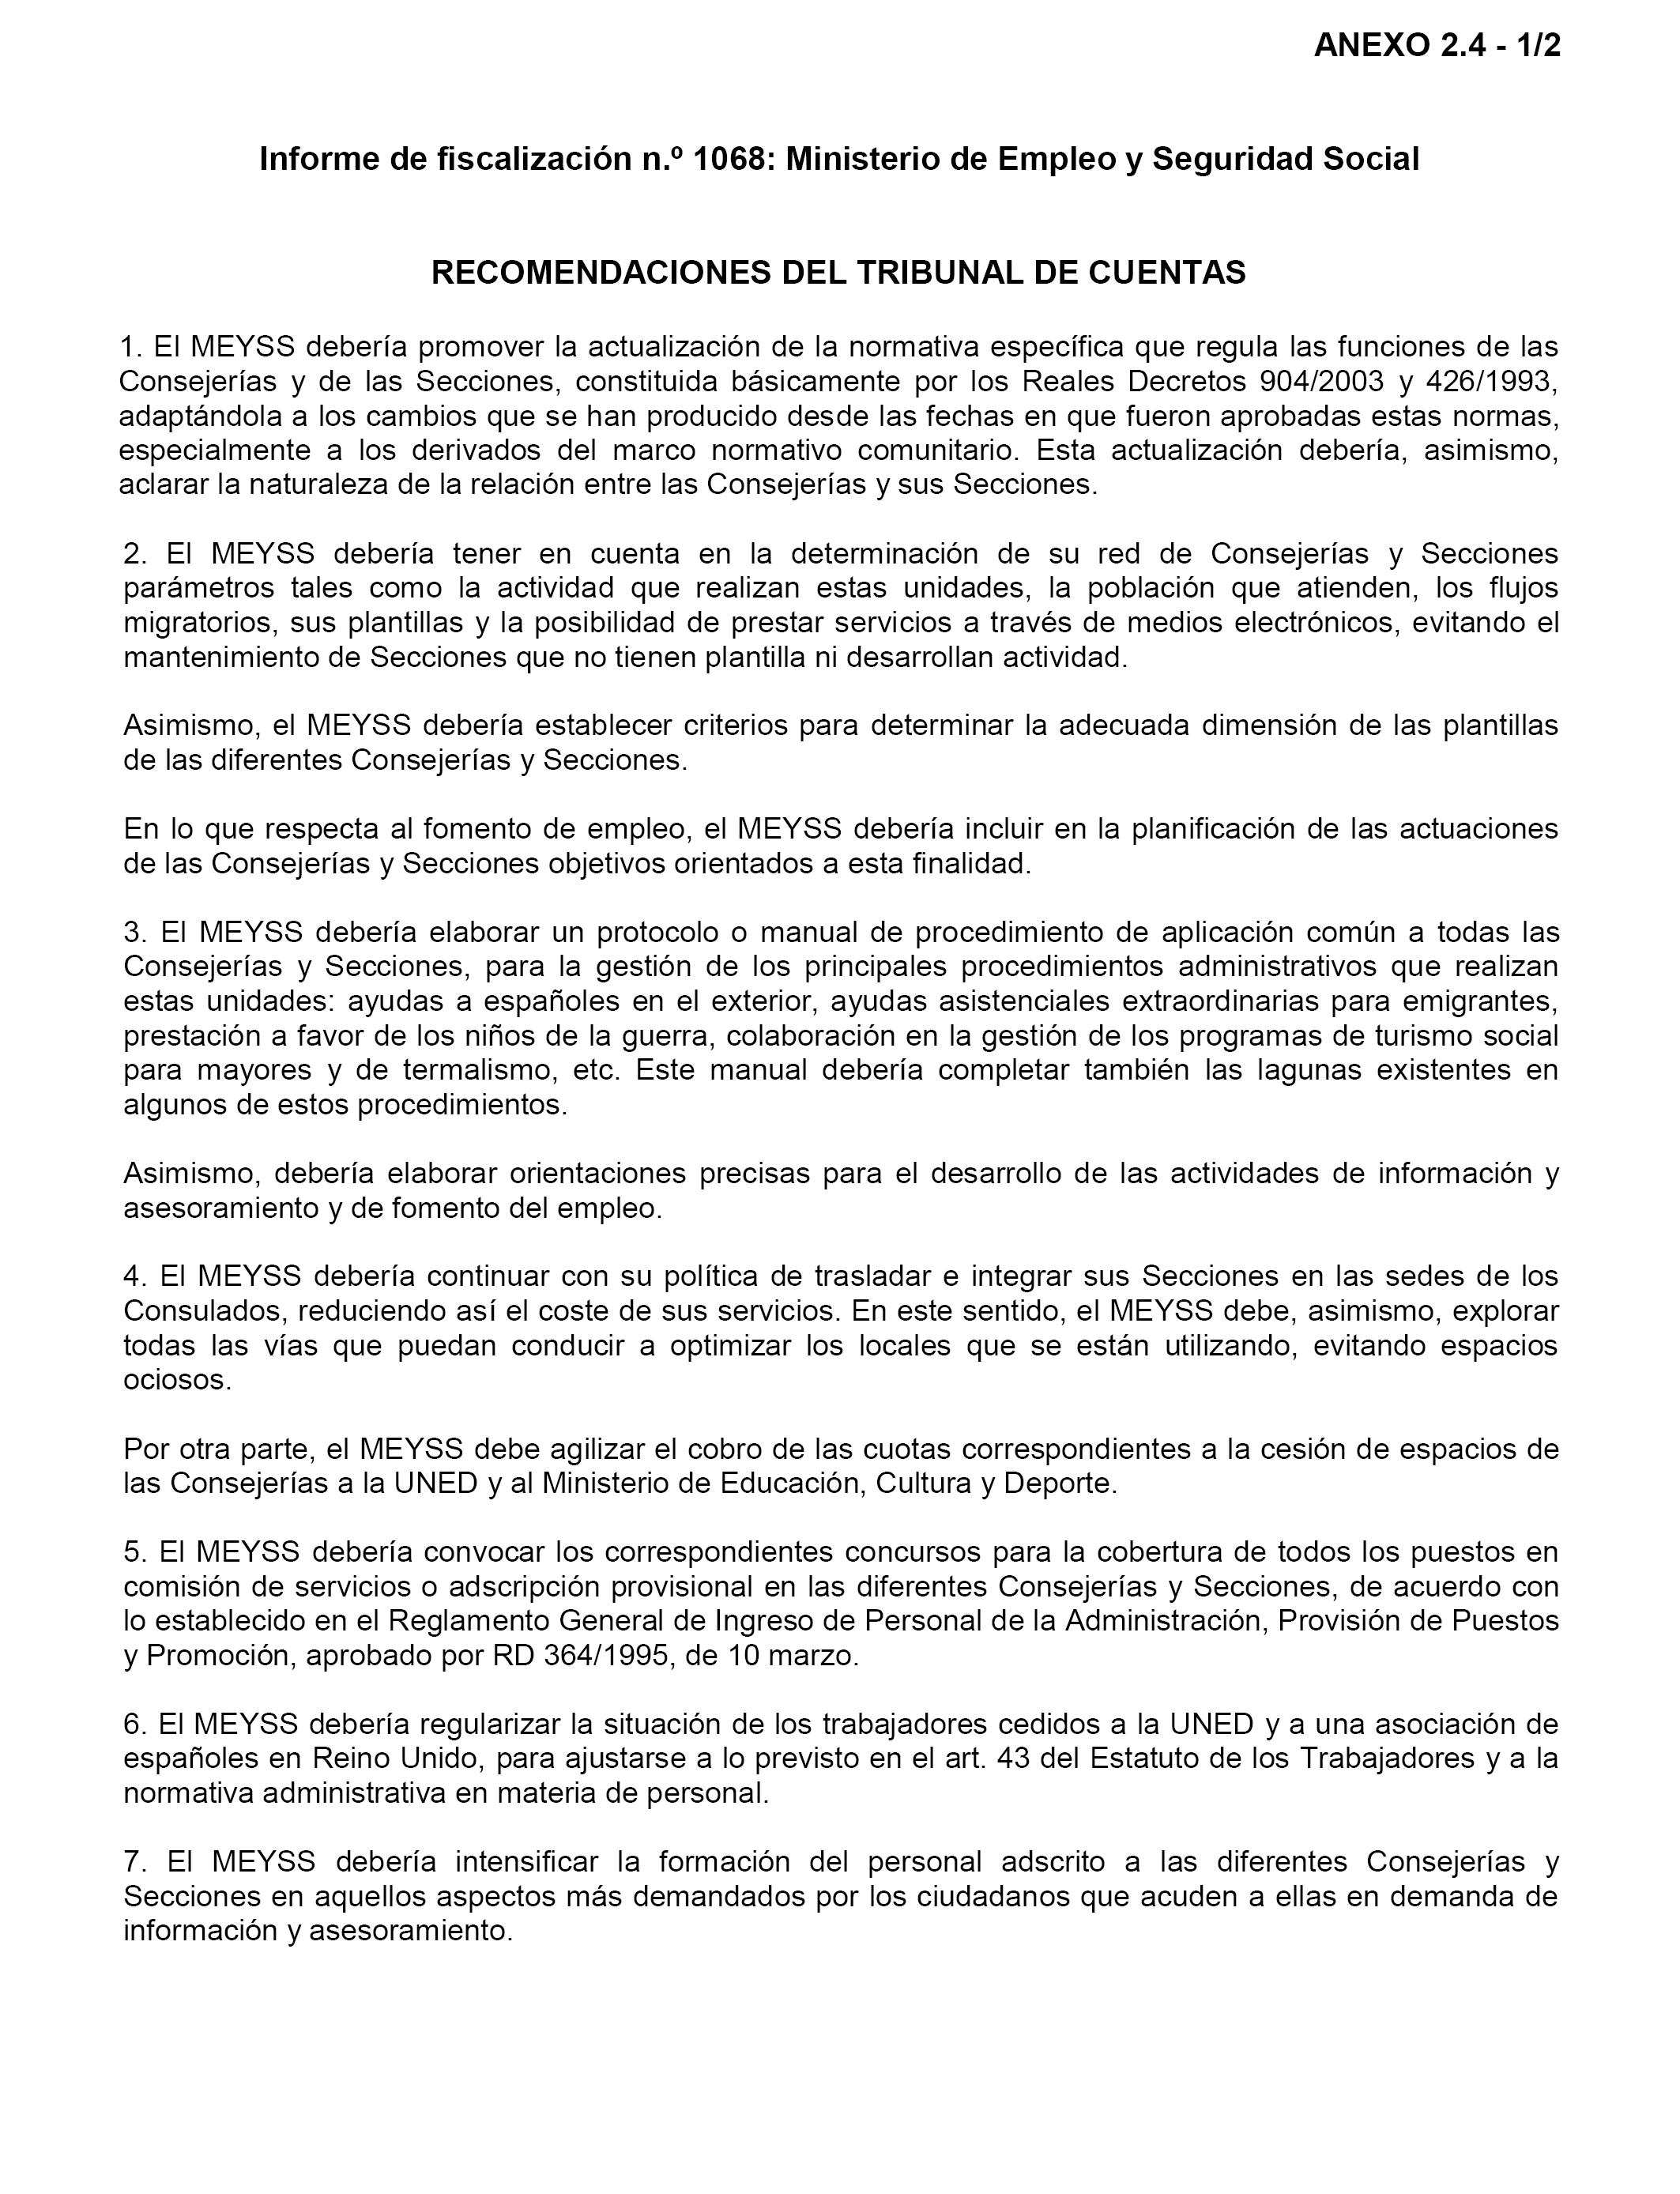 BOE.es - Documento BOE-A-2017-5226